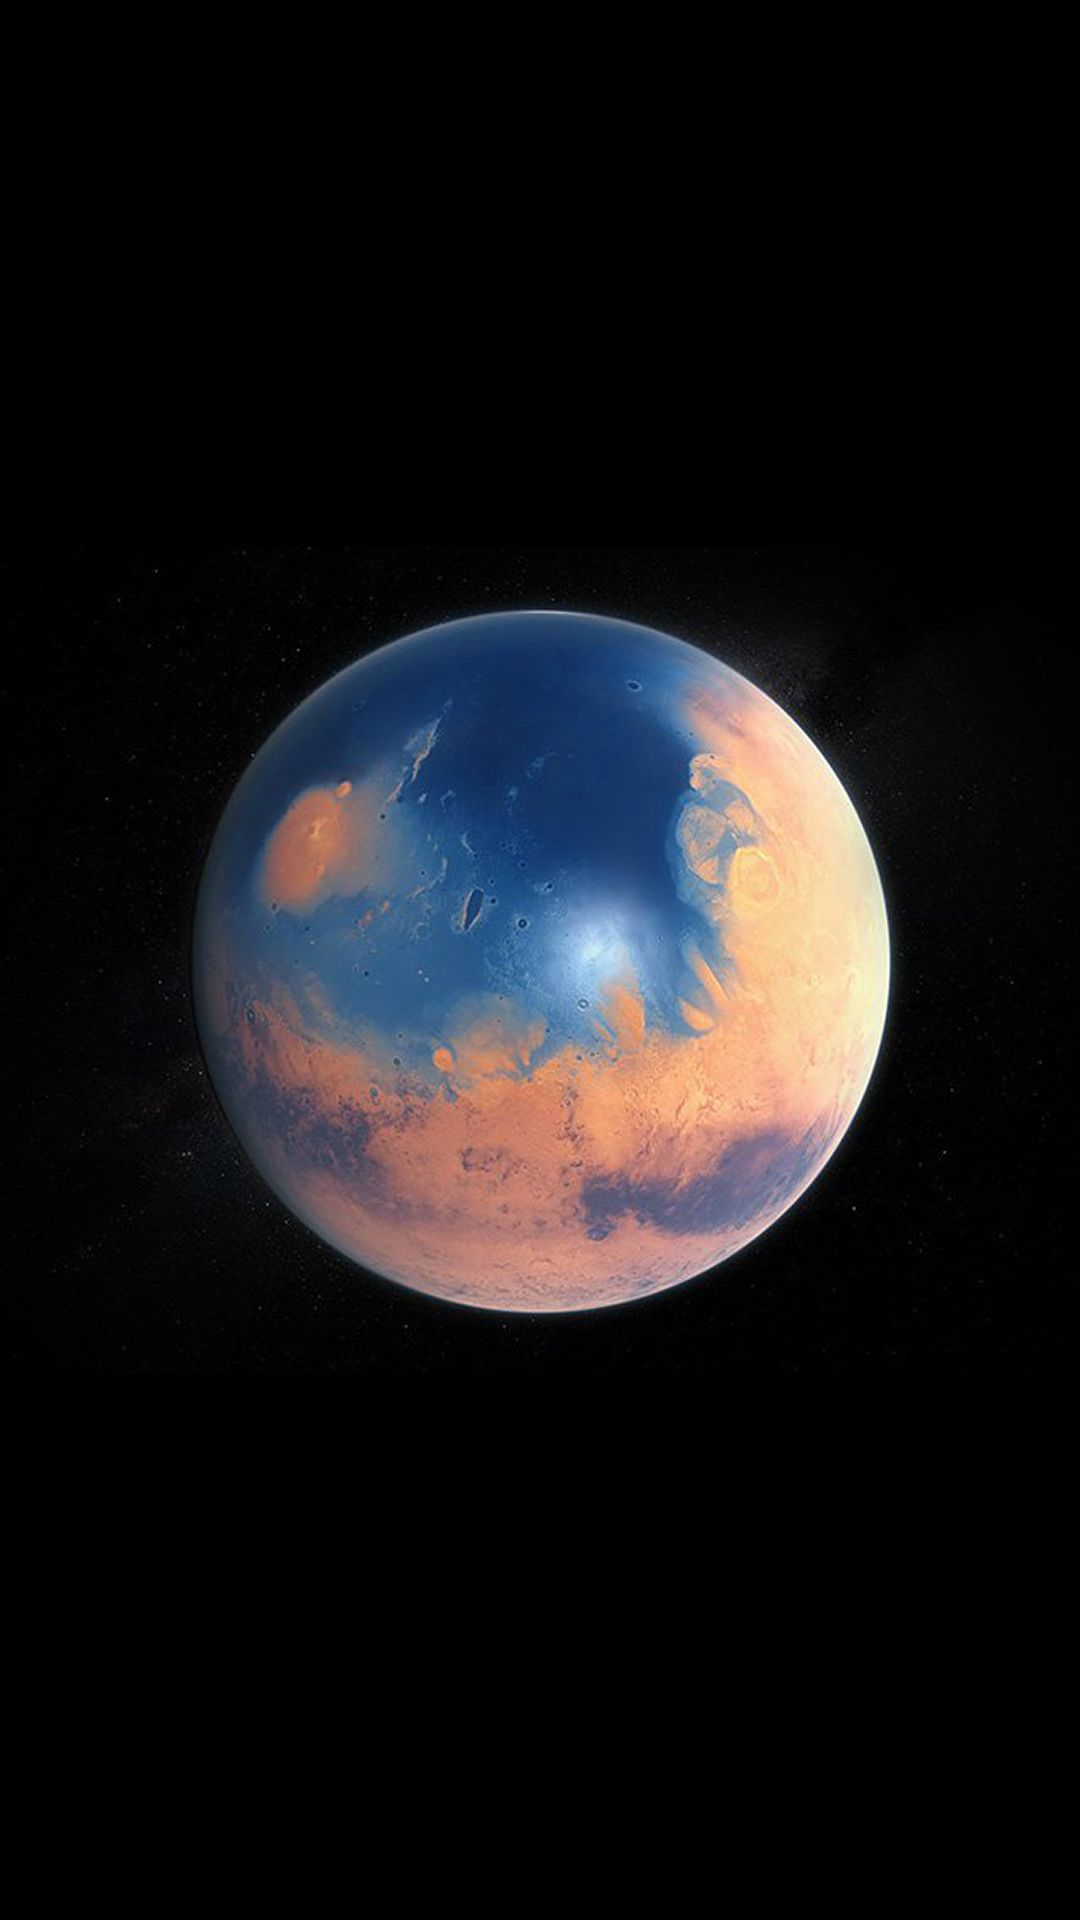 Space Earth Planet Art Illust Dark IPhone 6 Plus Wallpaper